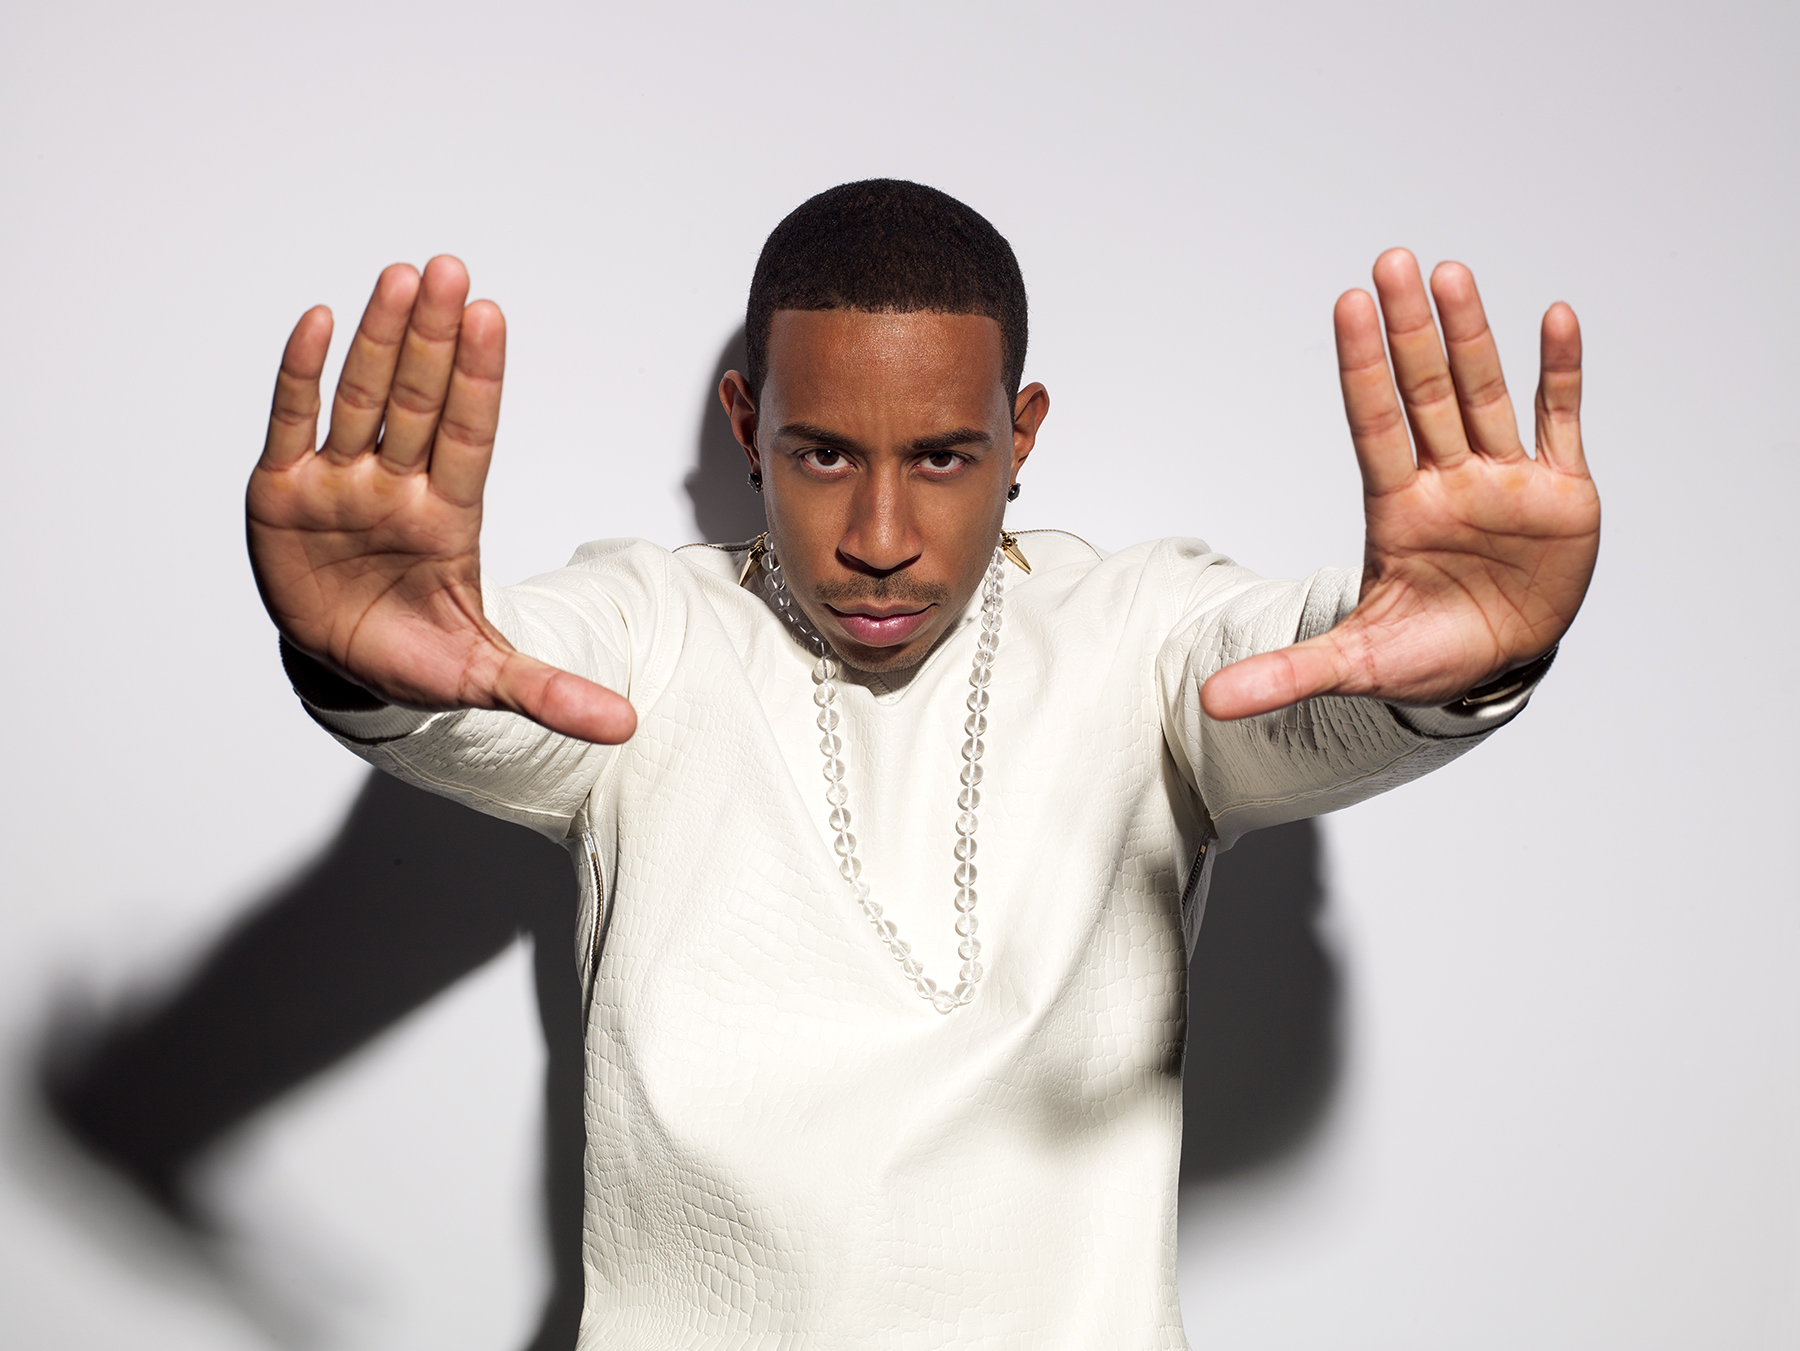 Ludacris, Ludaversal